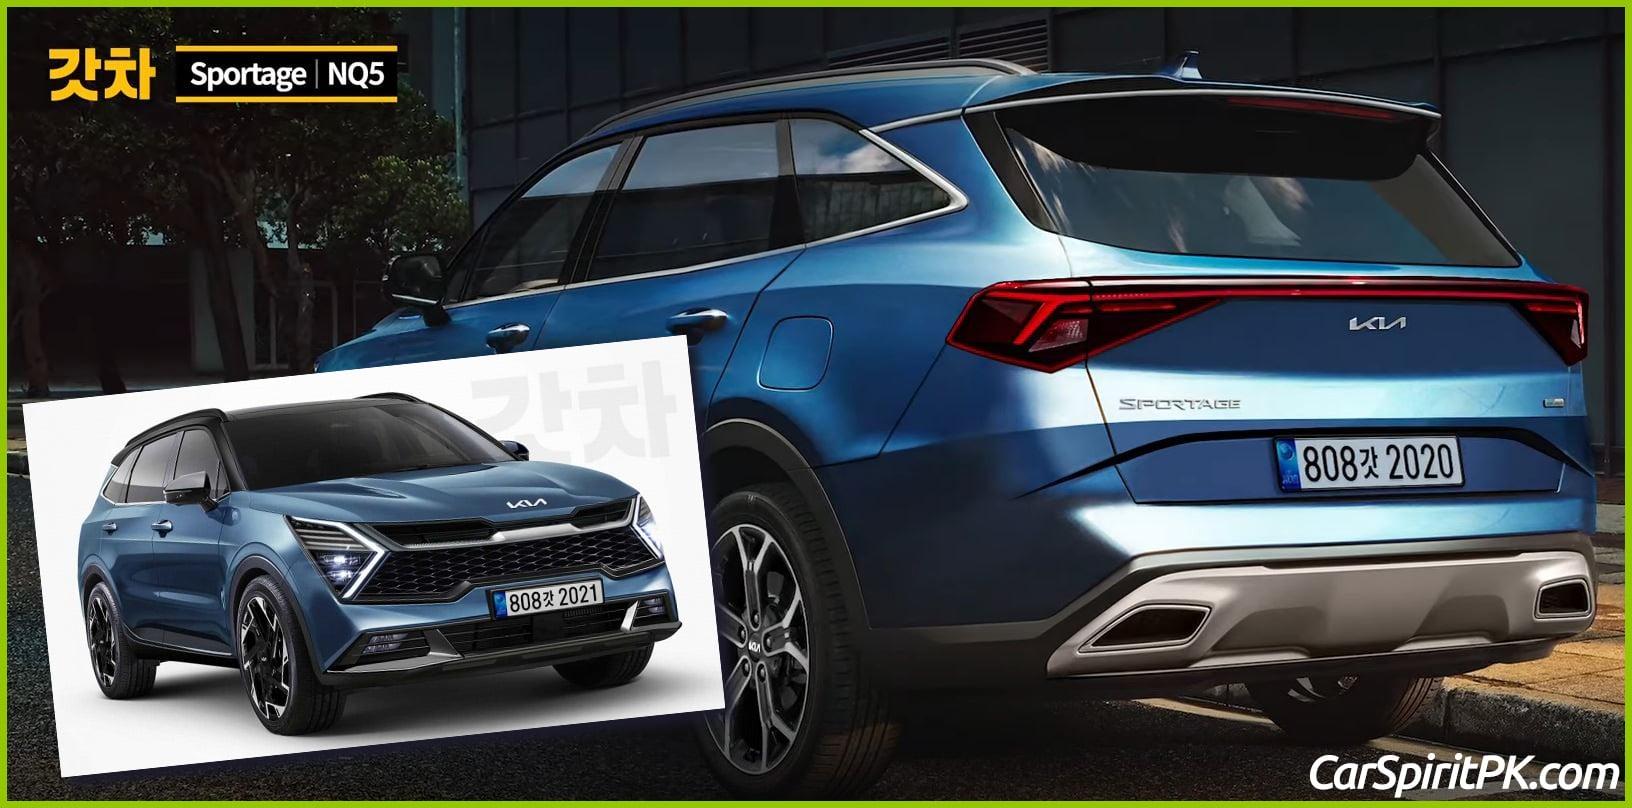 Kia Teases the All-New Next Generation Sportage SUV